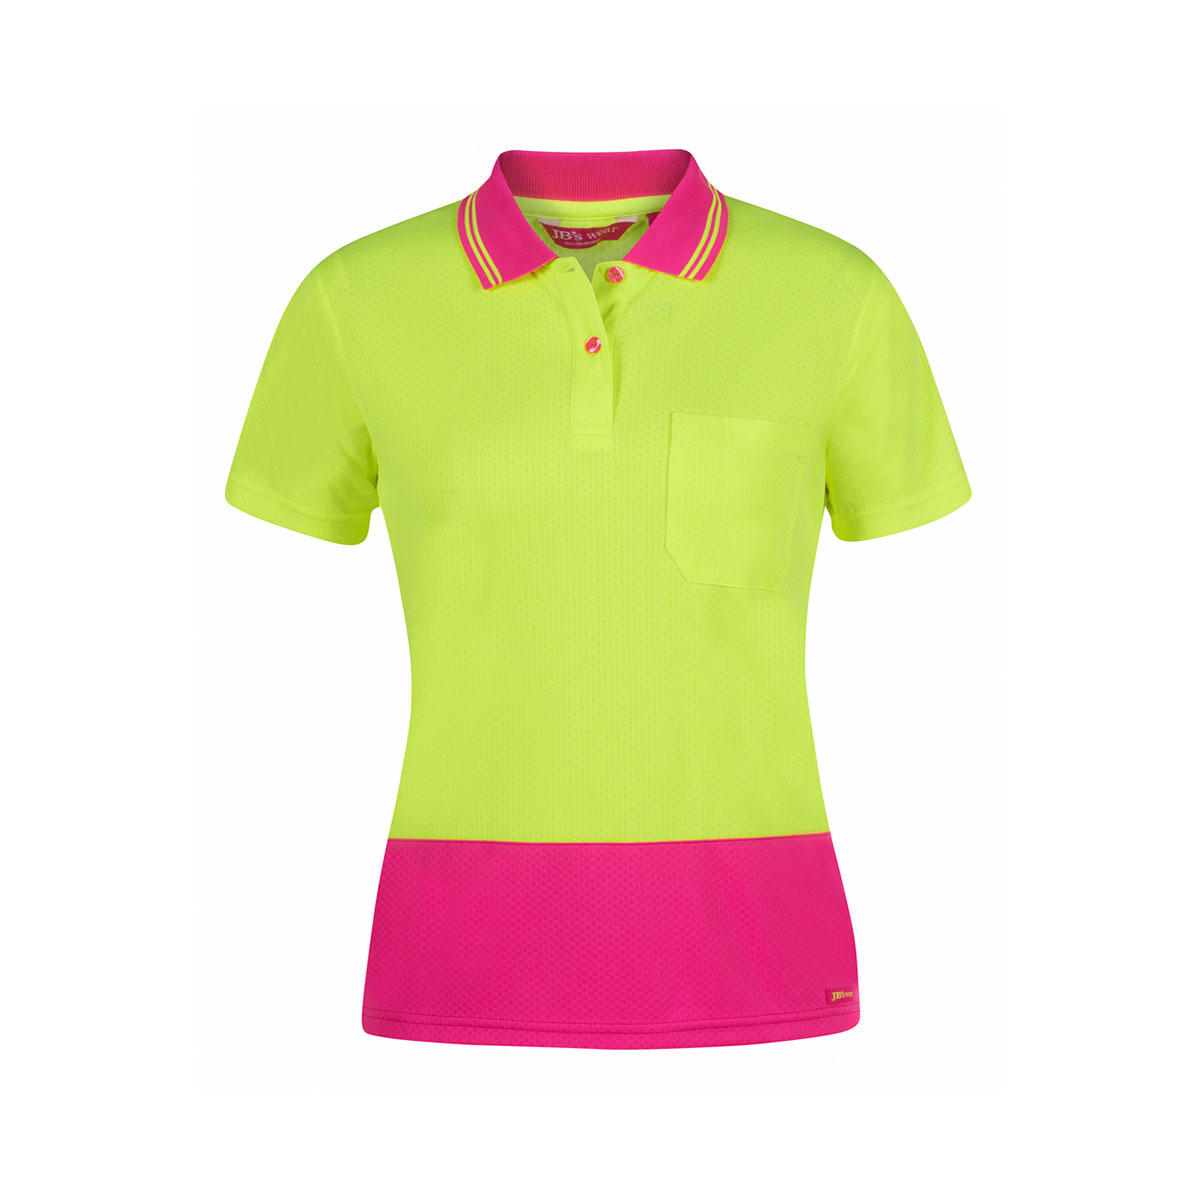 Ladies Hi Vis S/S Jacquard Polo-Lime  /  Pink